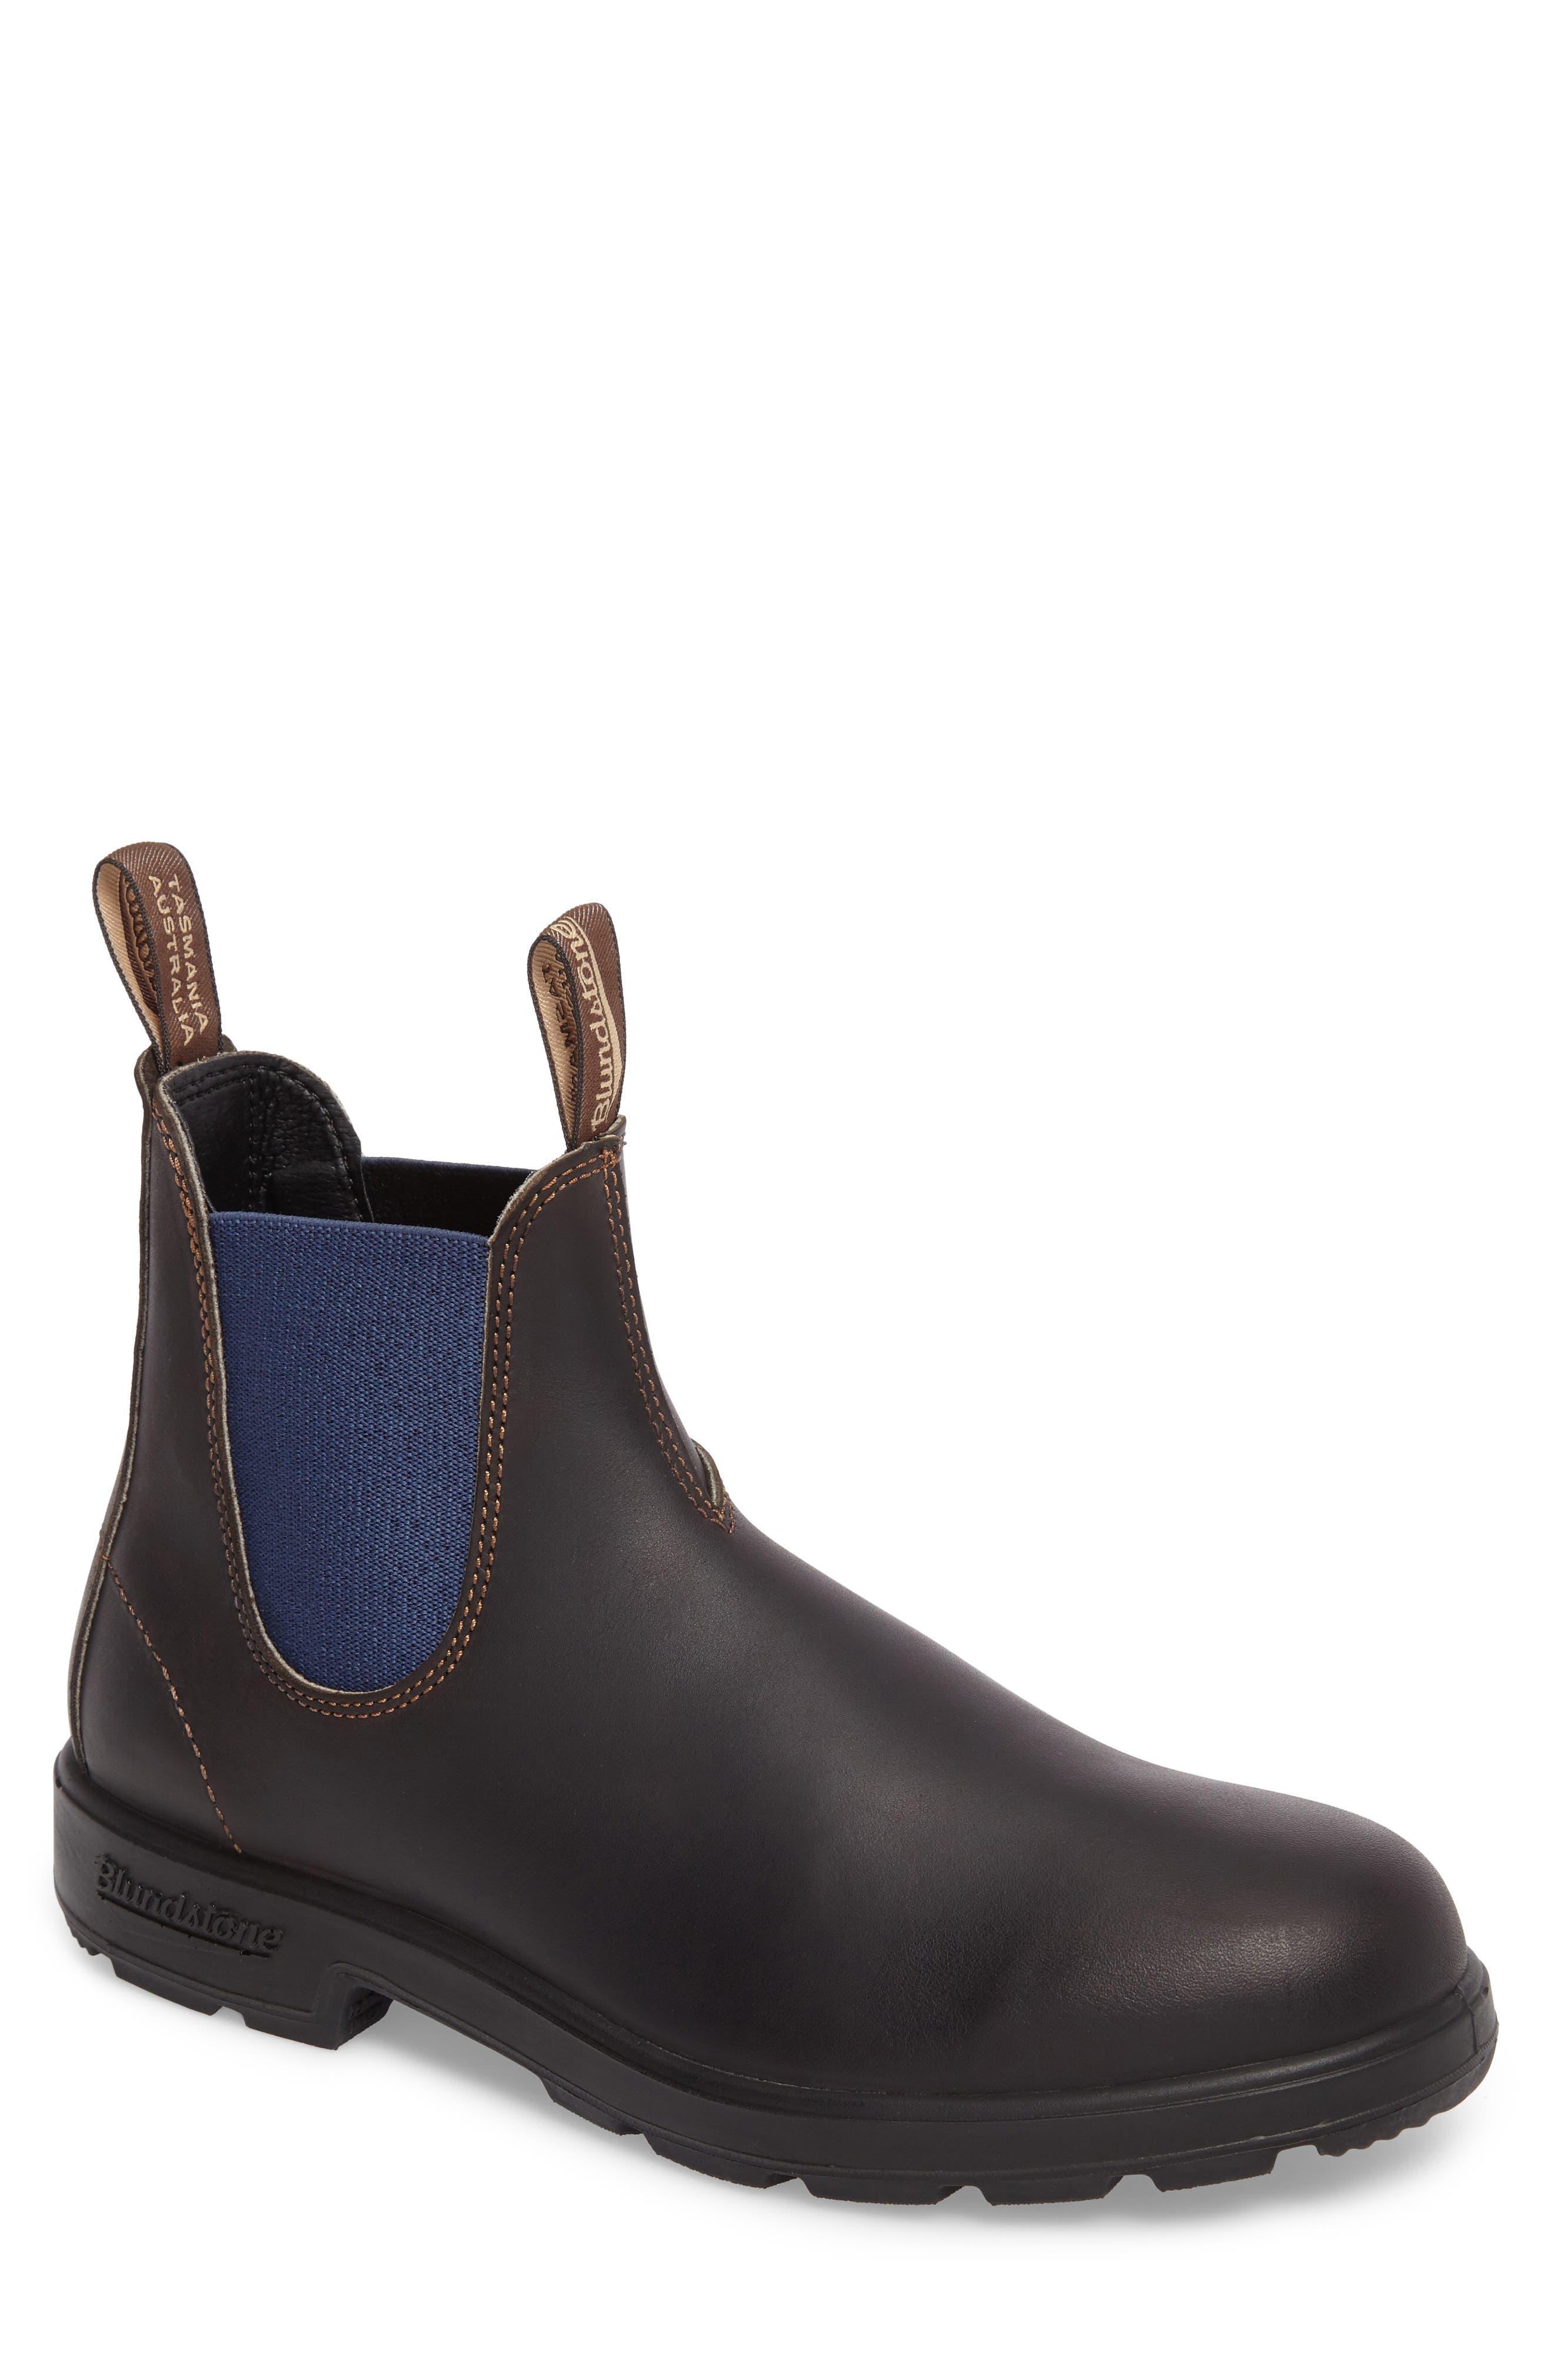 Blundstone Chelsea Boot, Brown